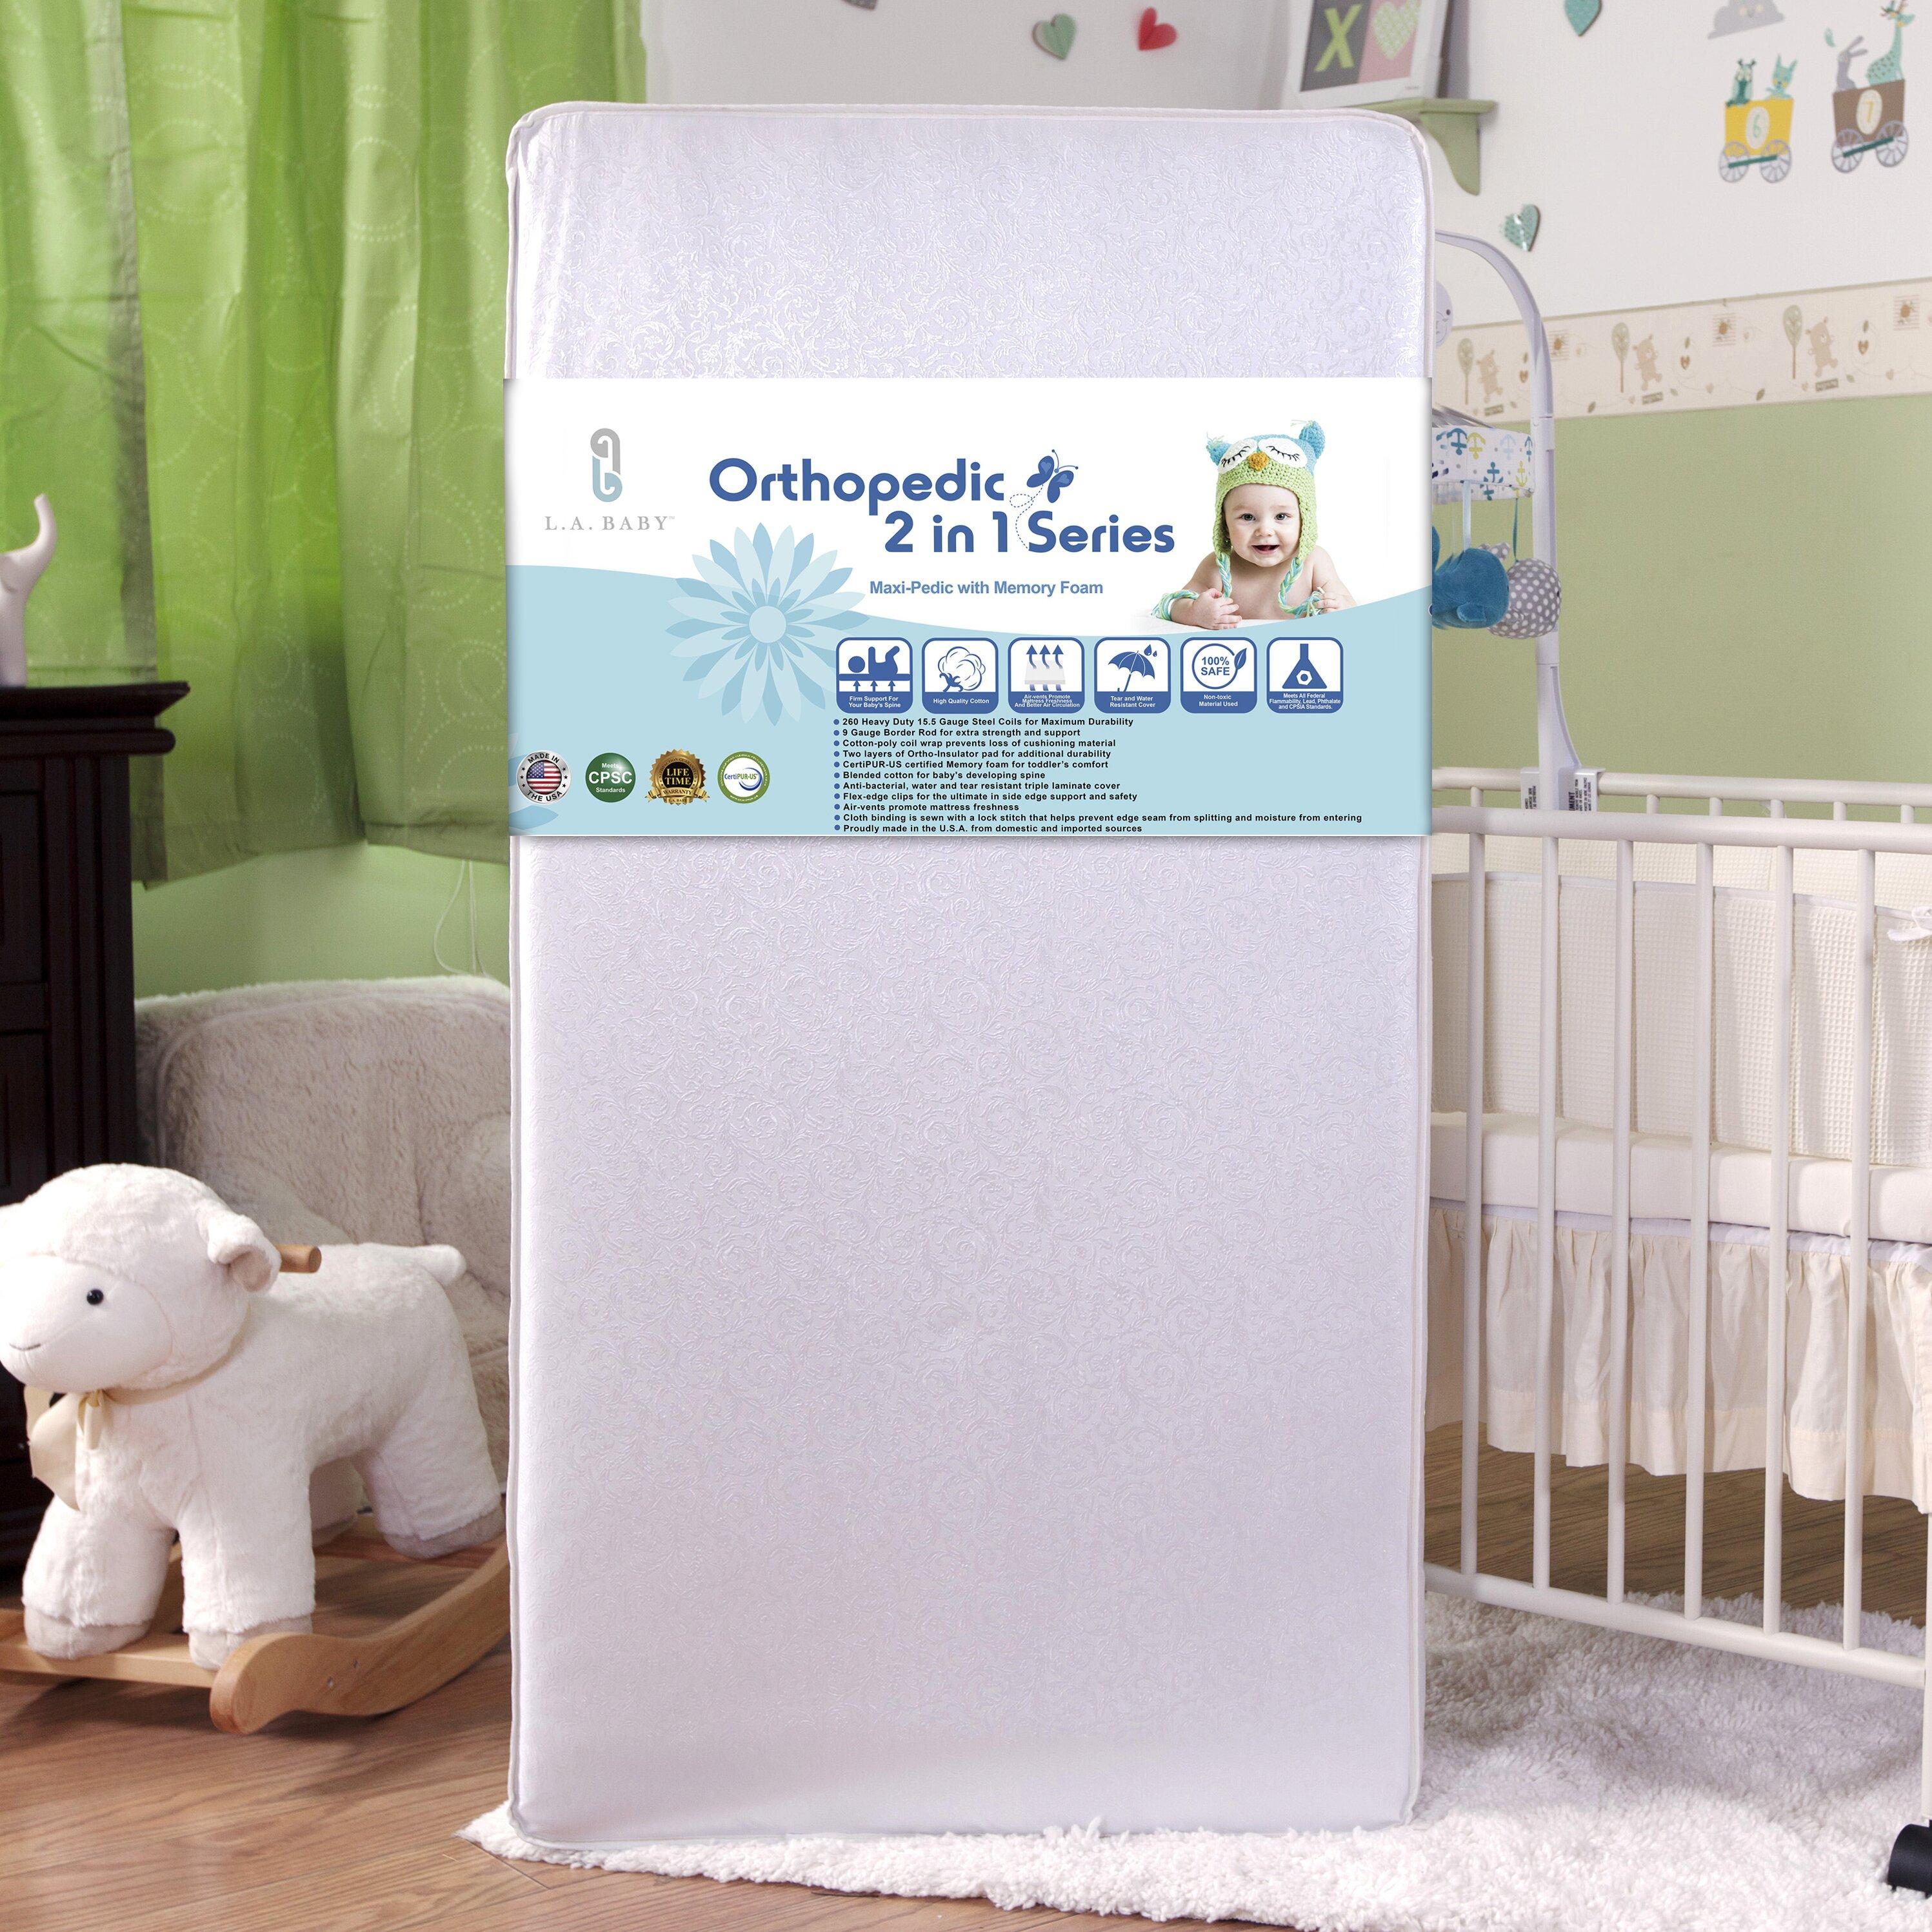 Special enclosed crib for premature babies - L A Baby Maxi Pedic With Memory Foam Crib Mattress